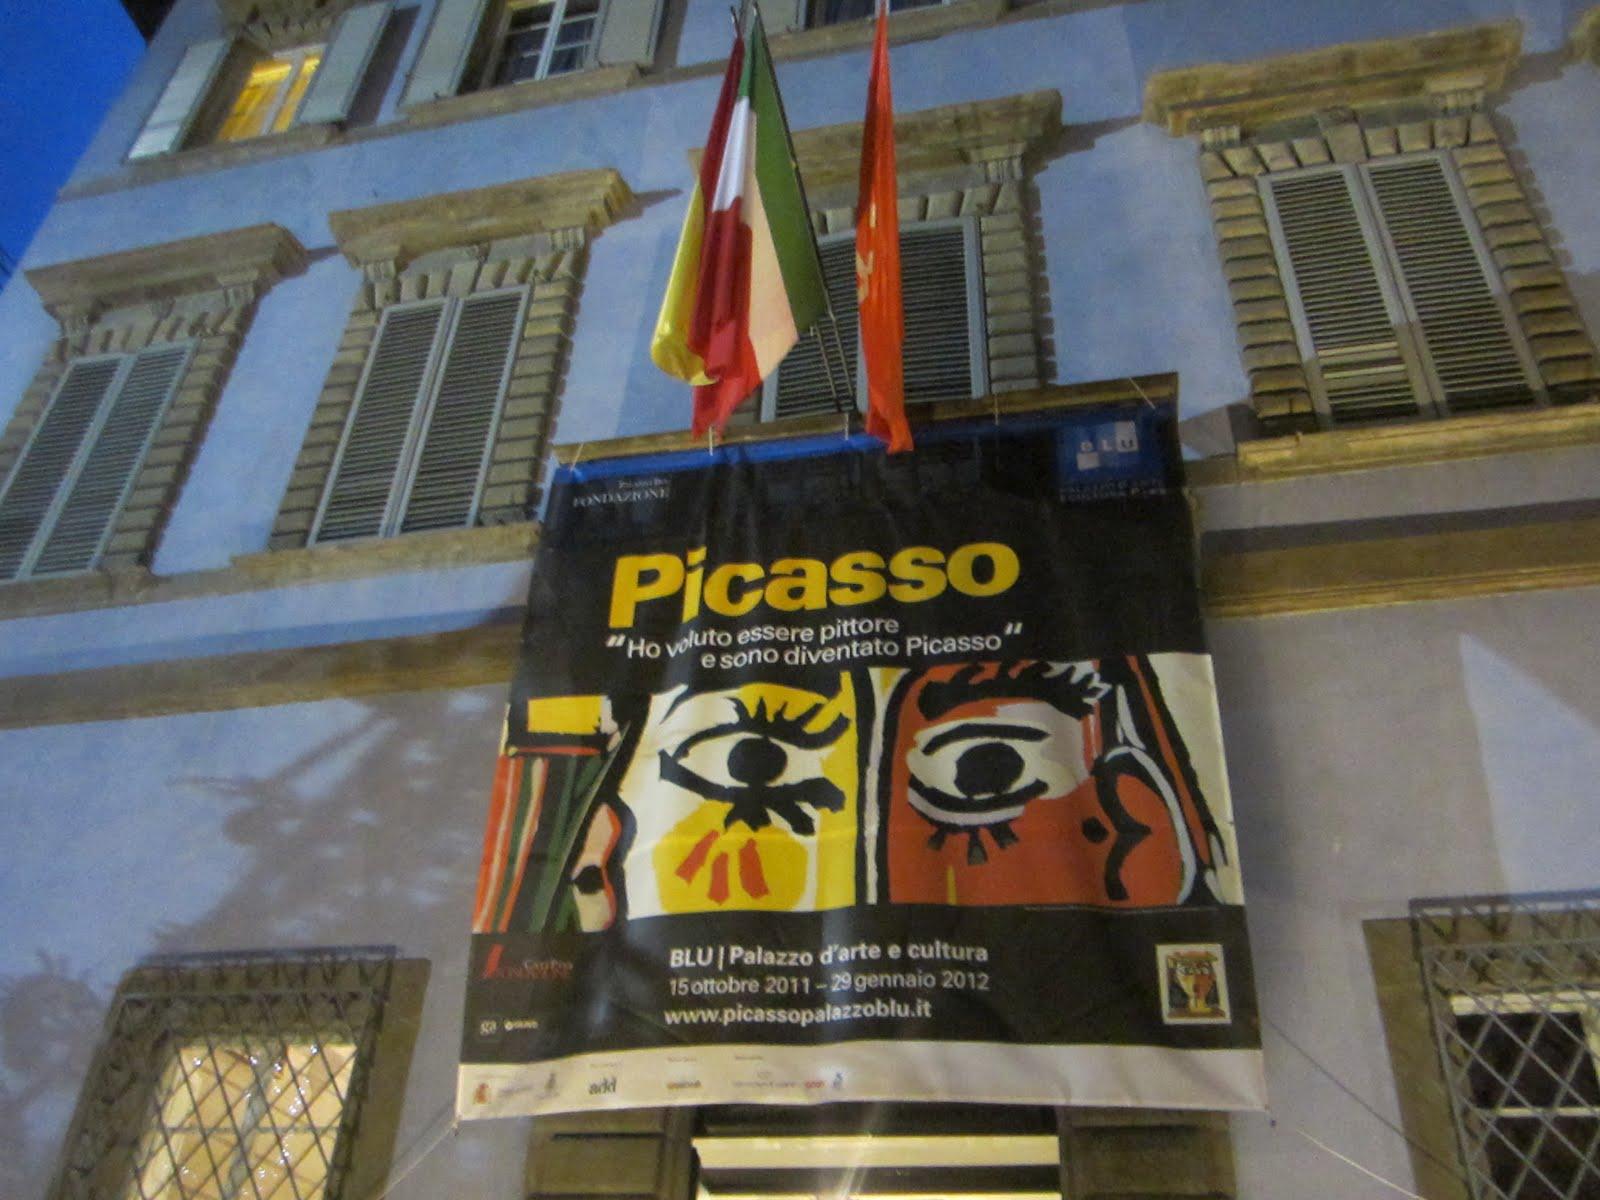 picasso palazzo blu exhibit pisa